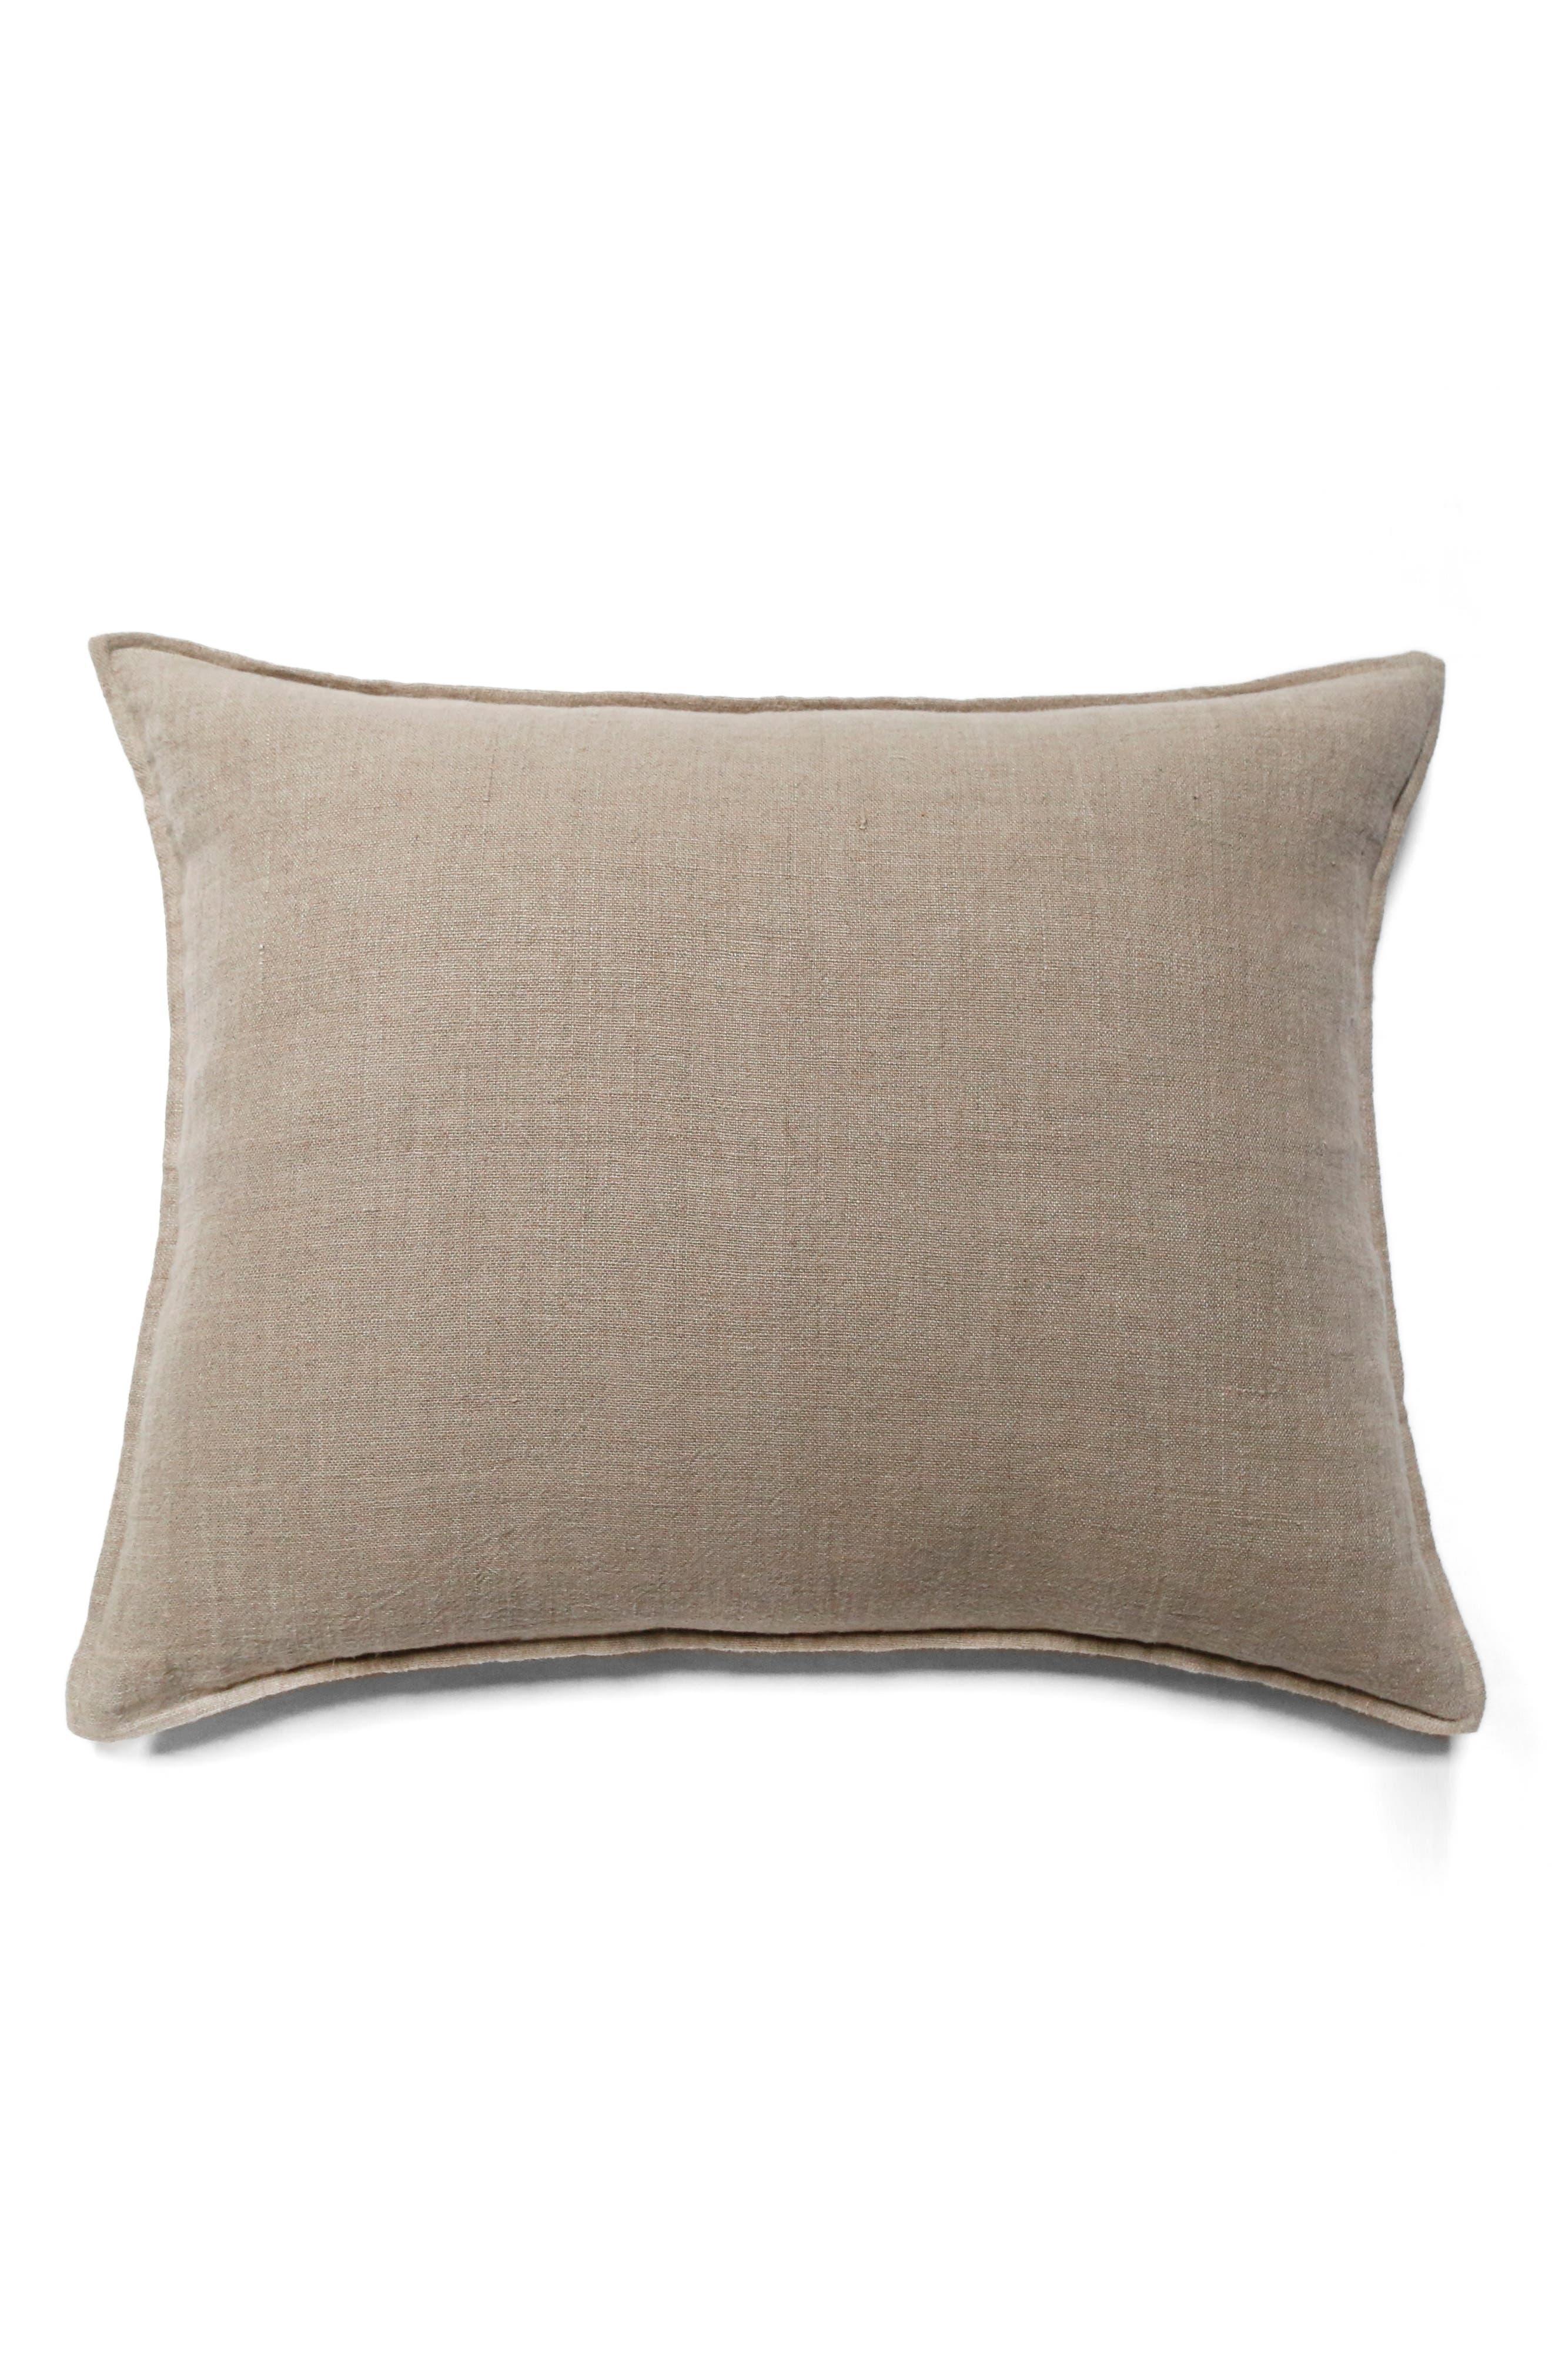 Main Image - Pom Pom at Home Montauk Big Accent Pillow